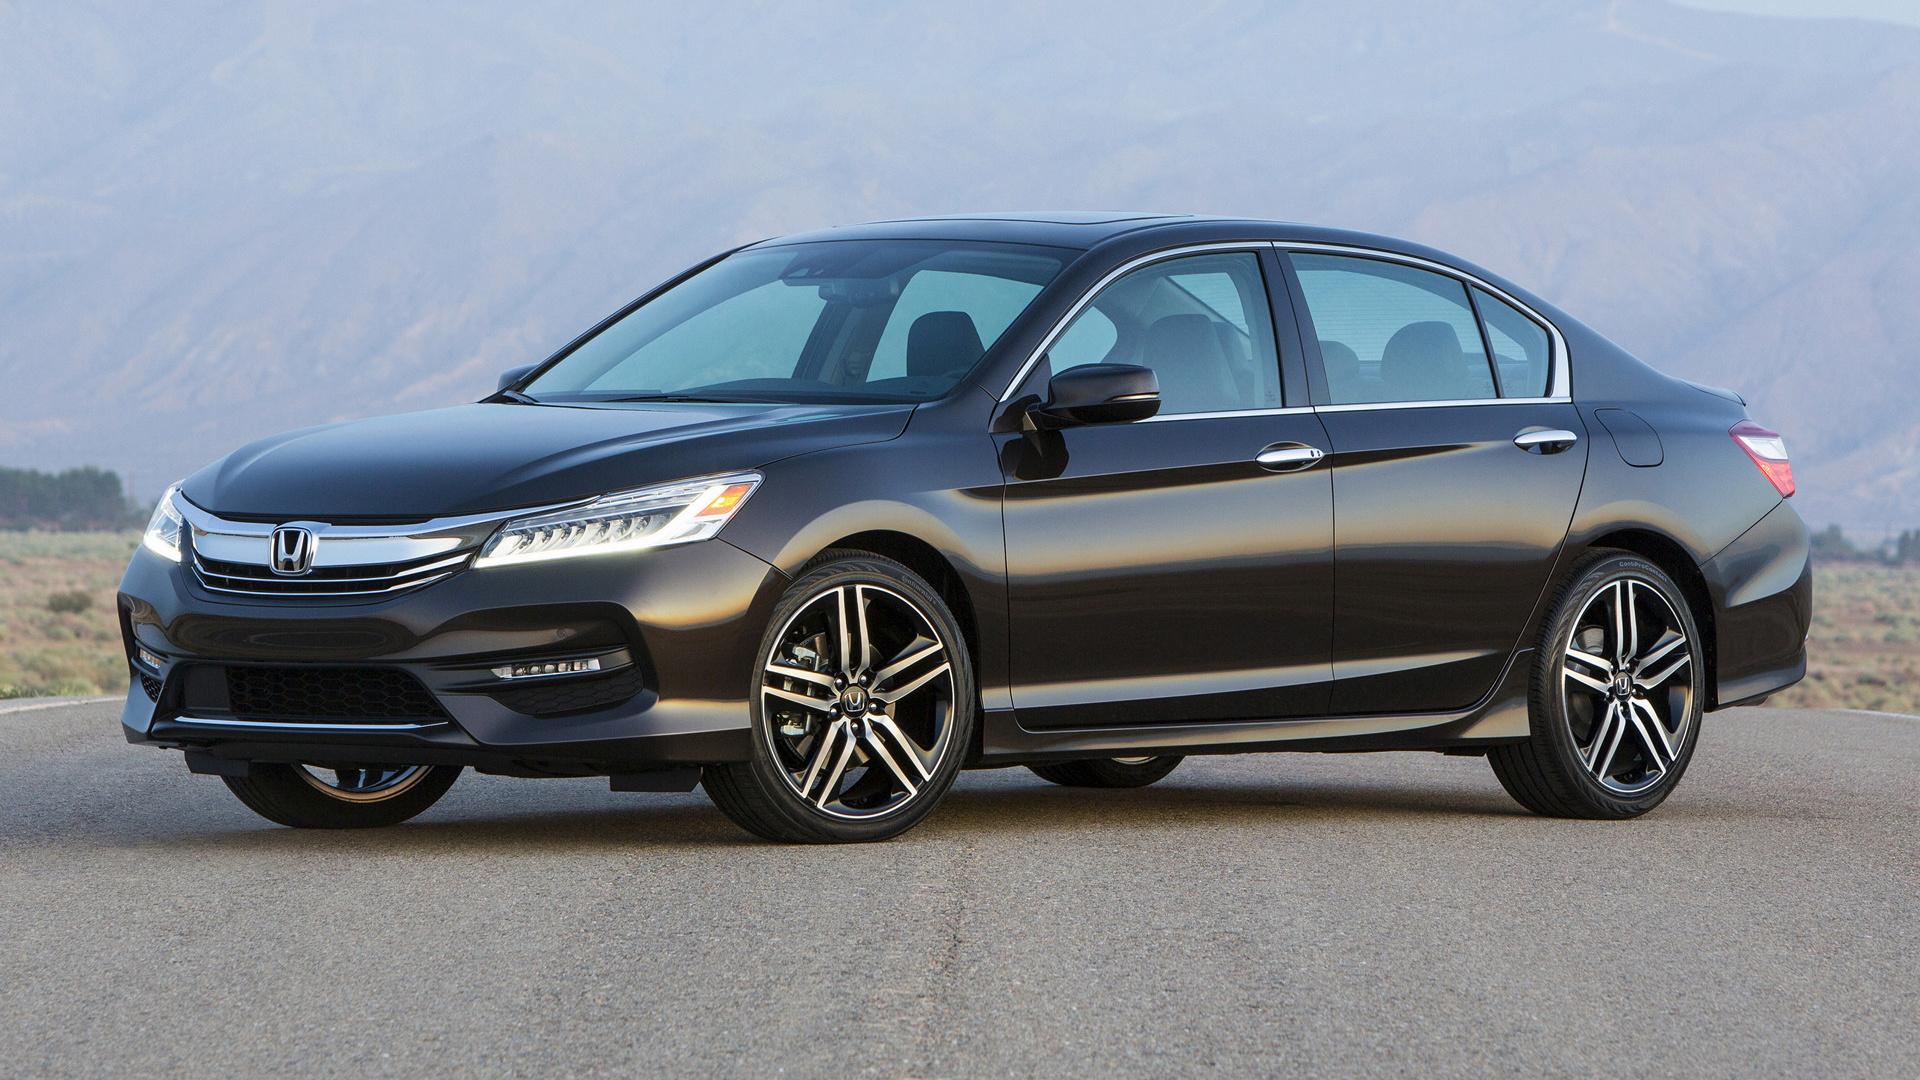 Honda Accord Touring (2016) US Wallpapers and HD Images